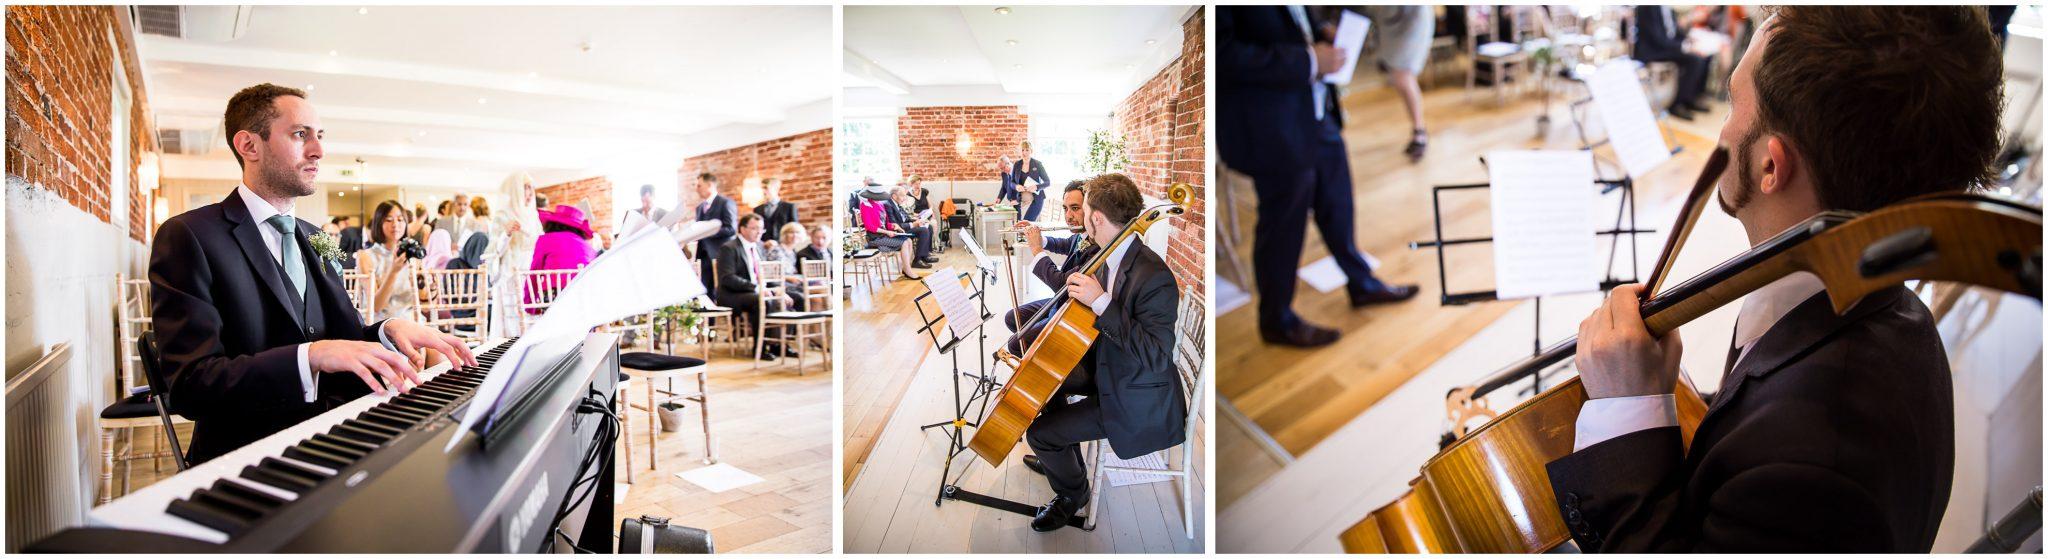 Sopley Mill Summer wedding ceremony music